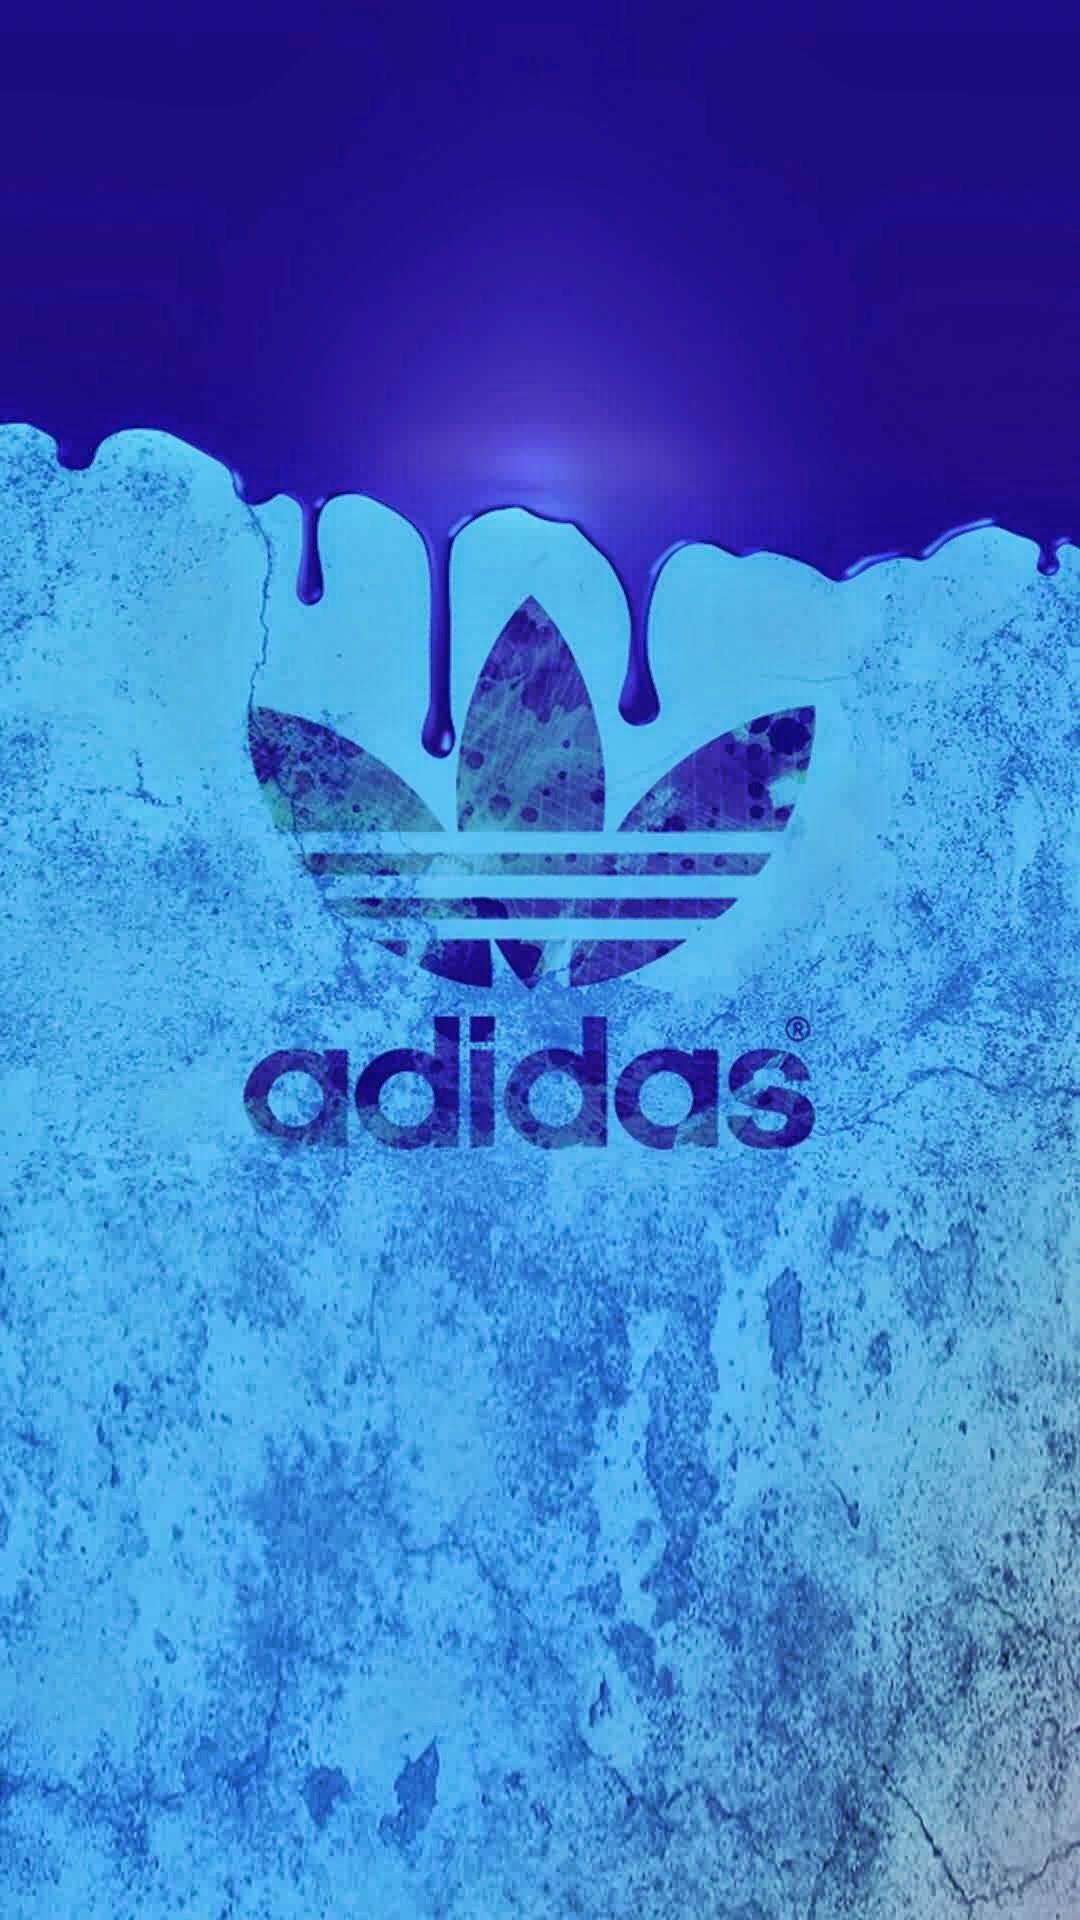 Pin By Mako Com Gogo On カラー Adidas Wallpapers Nike Wallpaper Adidas Logo Wallpapers